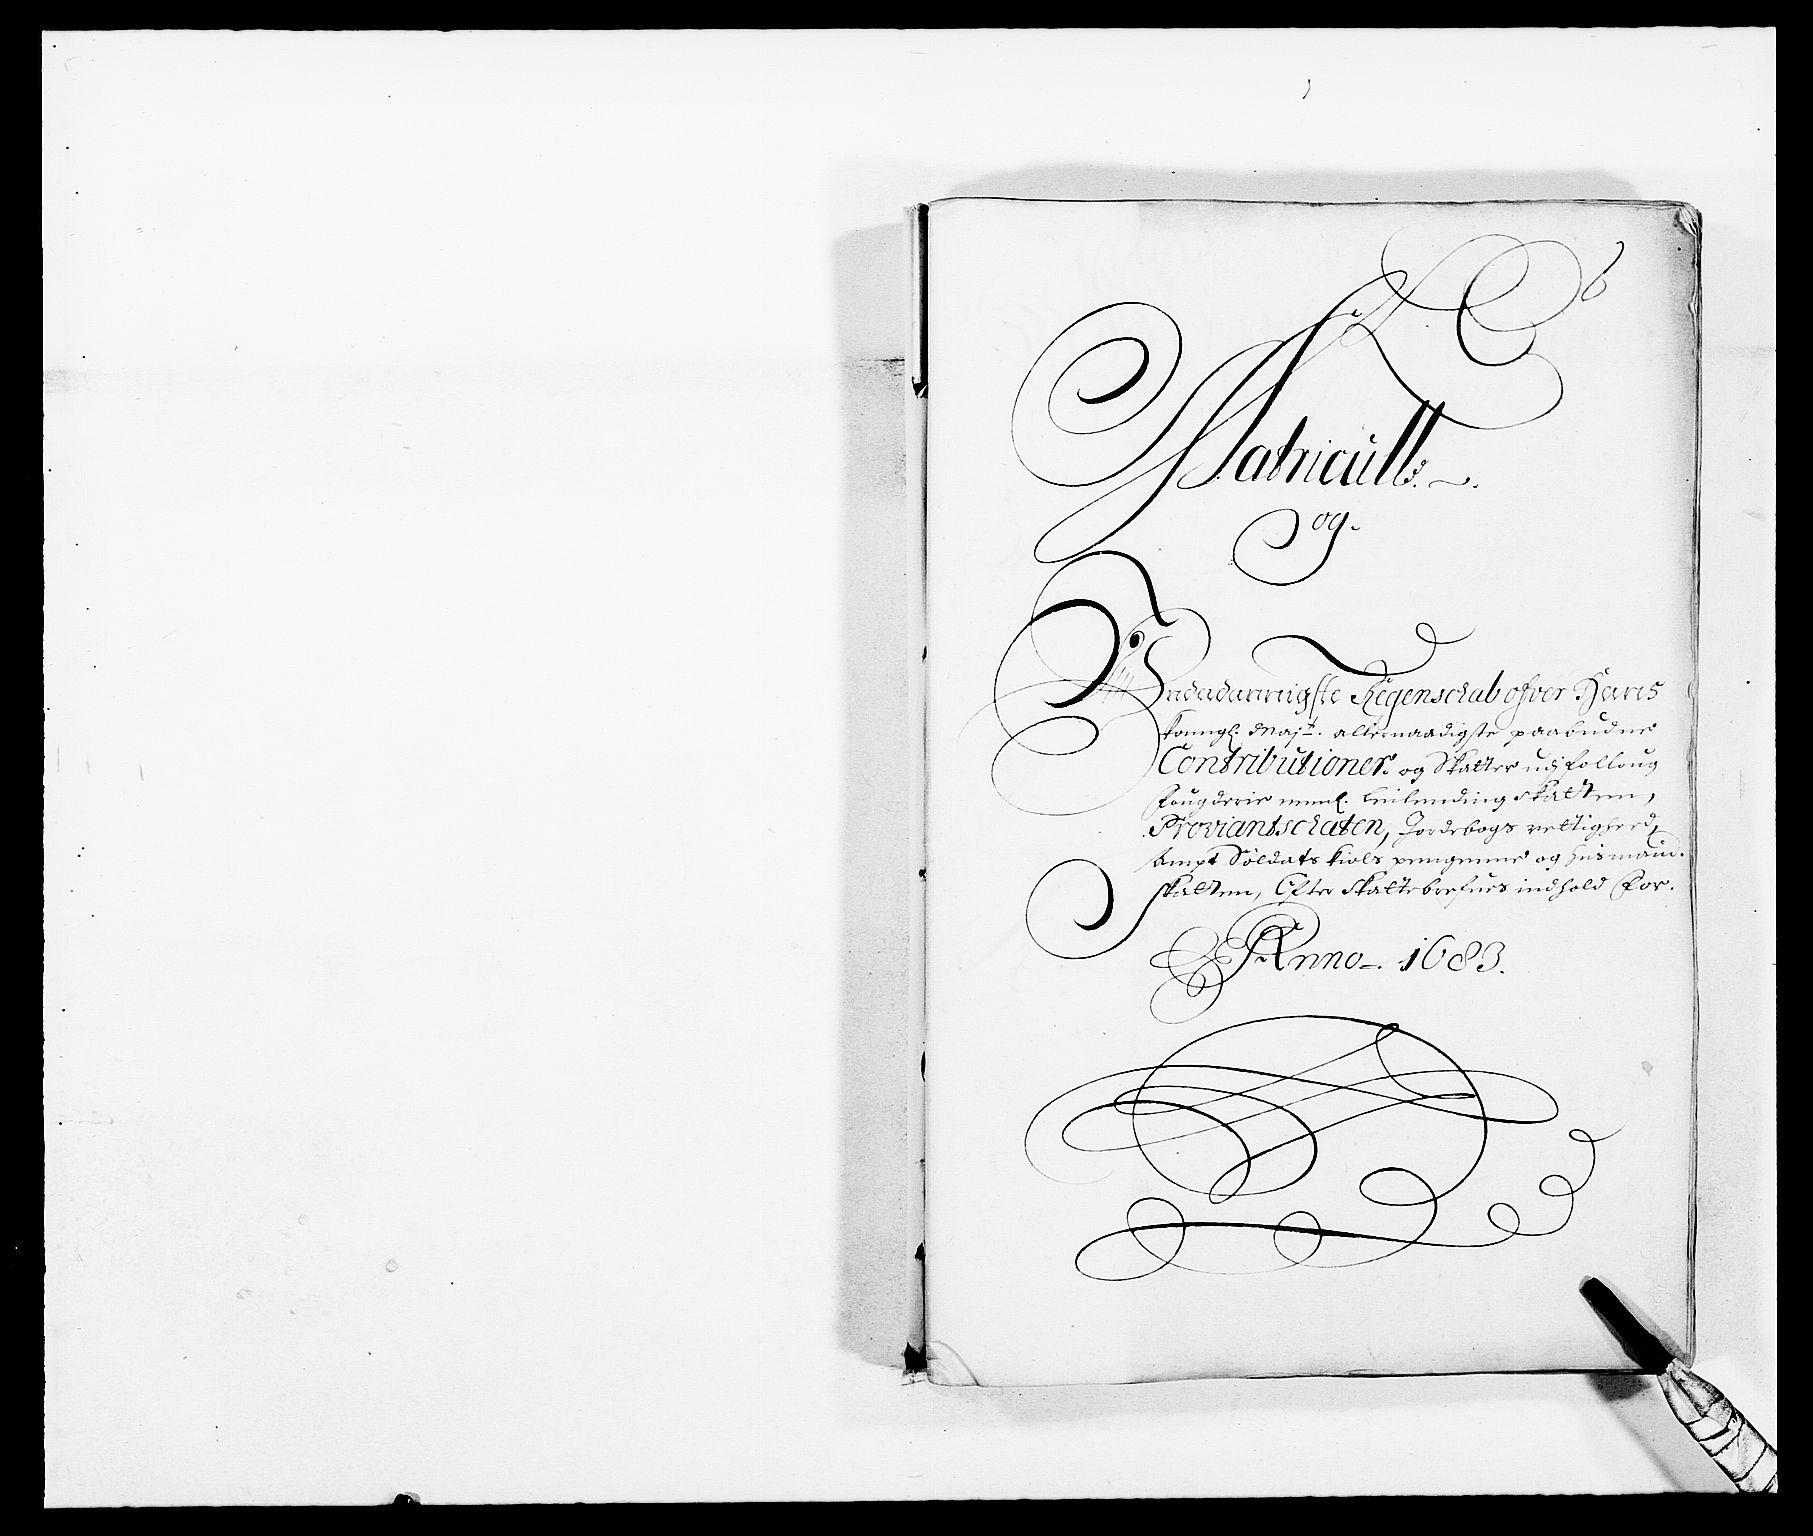 RA, Rentekammeret inntil 1814, Reviderte regnskaper, Fogderegnskap, R09/L0430: Fogderegnskap Follo, 1682-1683, s. 254